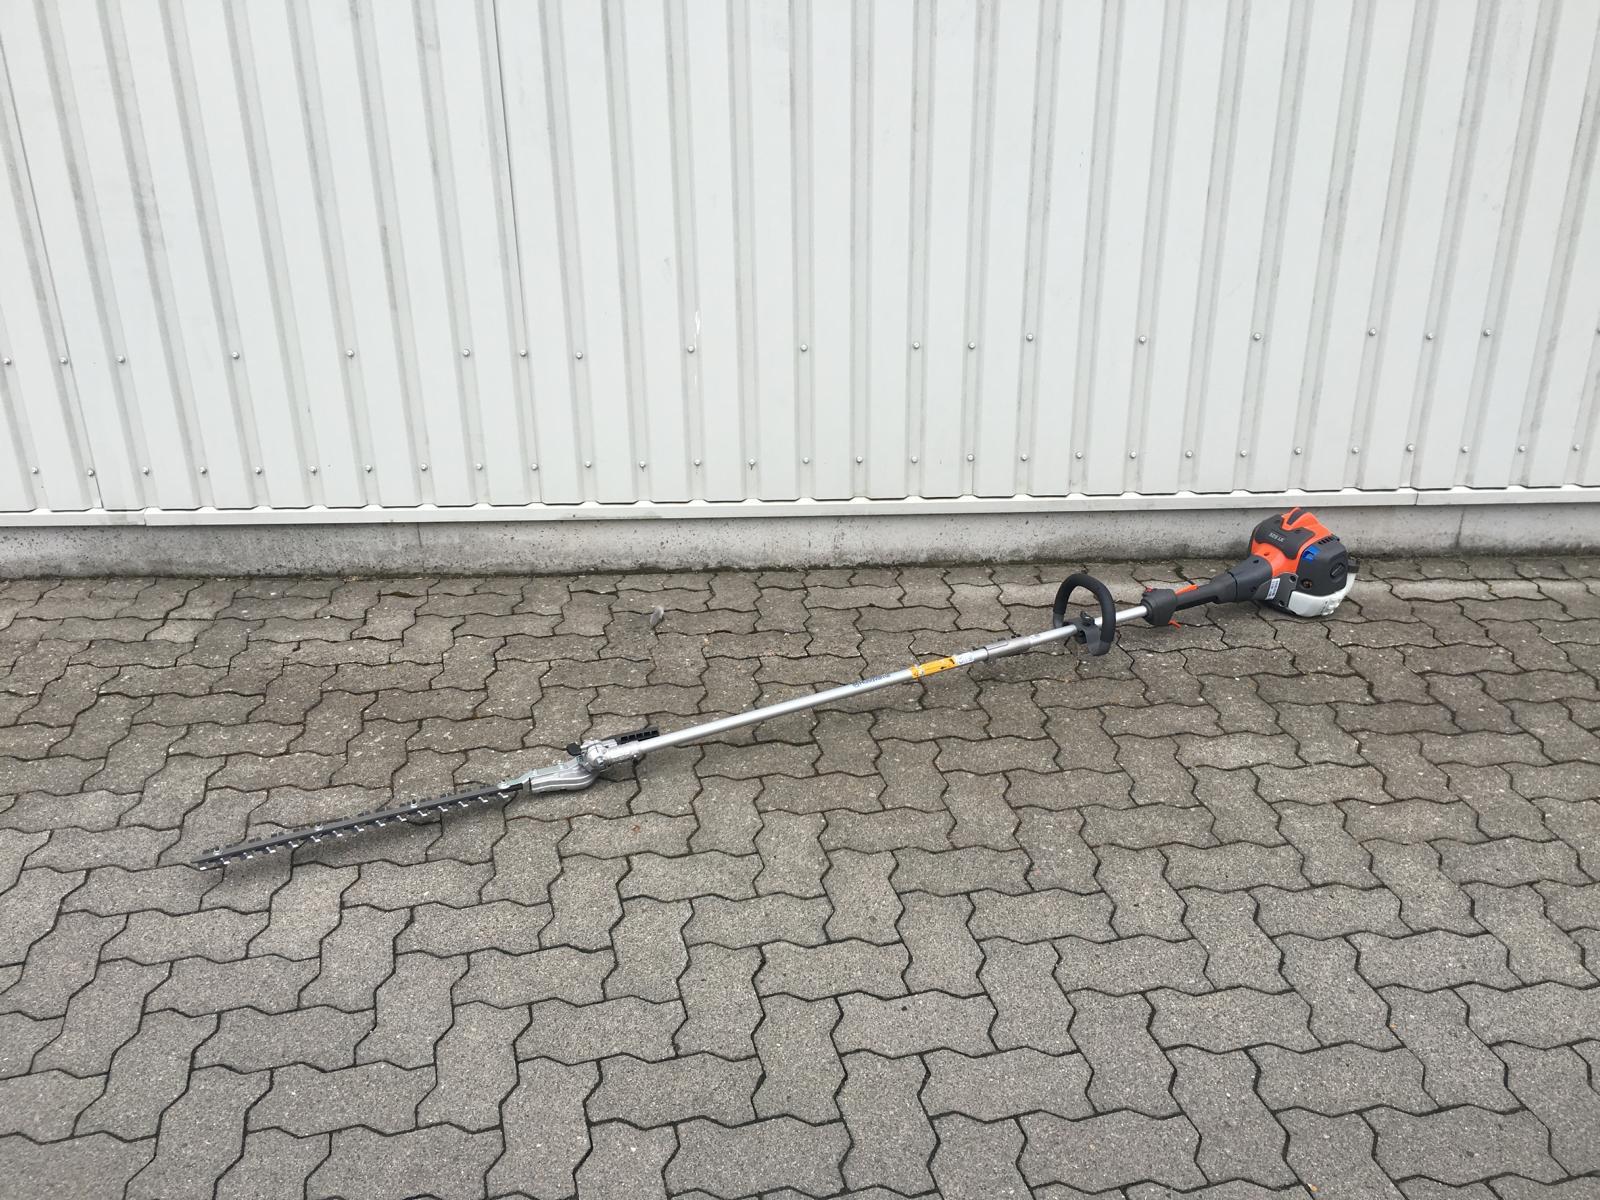 Hoch-Heckenschere, Teilabrer Trimmer, Husqvarna 525 LK, Mietpark Jappsen GmbH